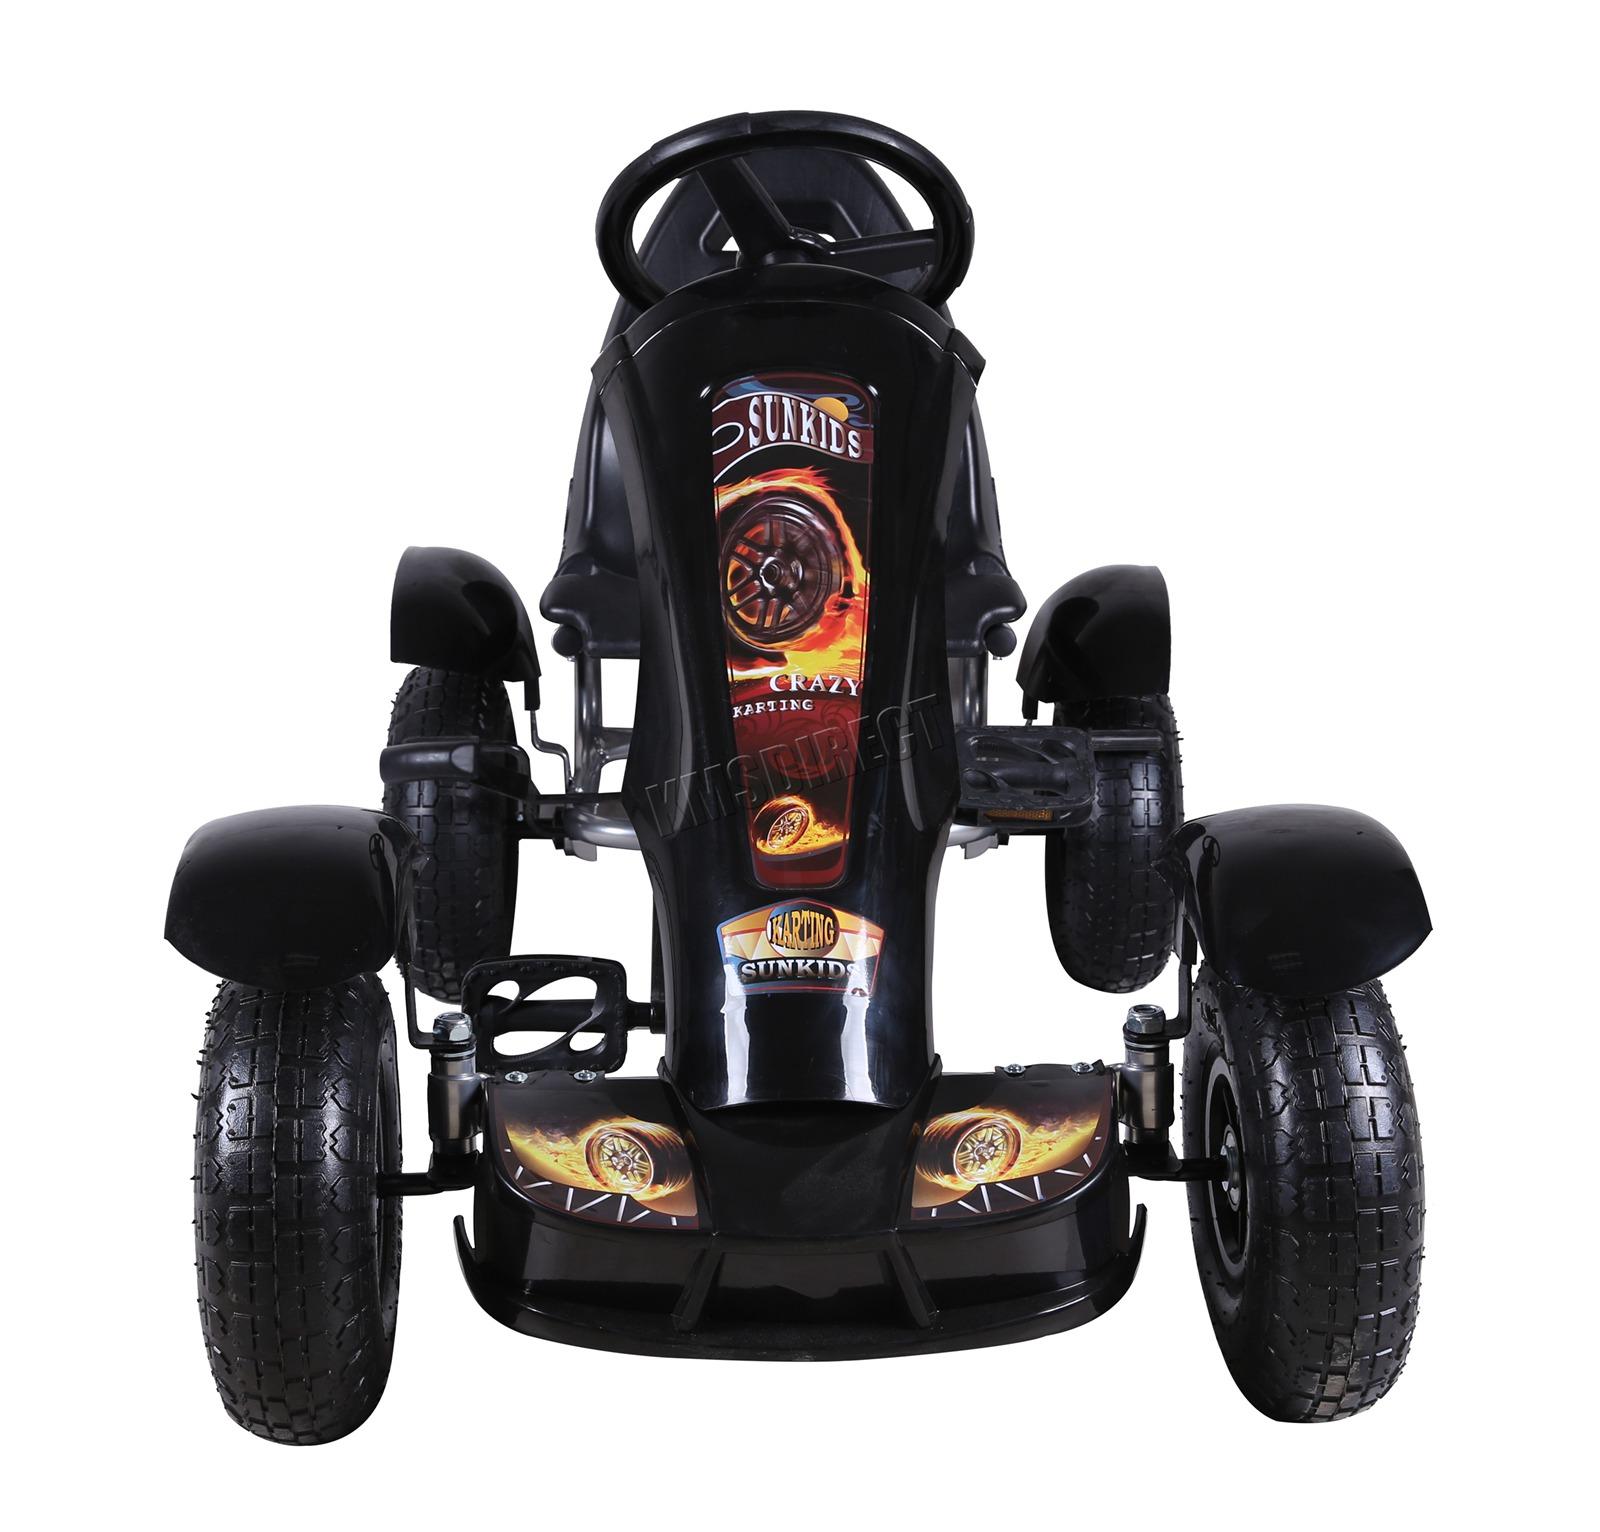 201701719267 2475 I 305 25 GOKART FH G03 BLACK KMSWM033 - Foxhunter Infantil Go Kart – Pedal Coche para Niños Gocart con Freno de Mano G03